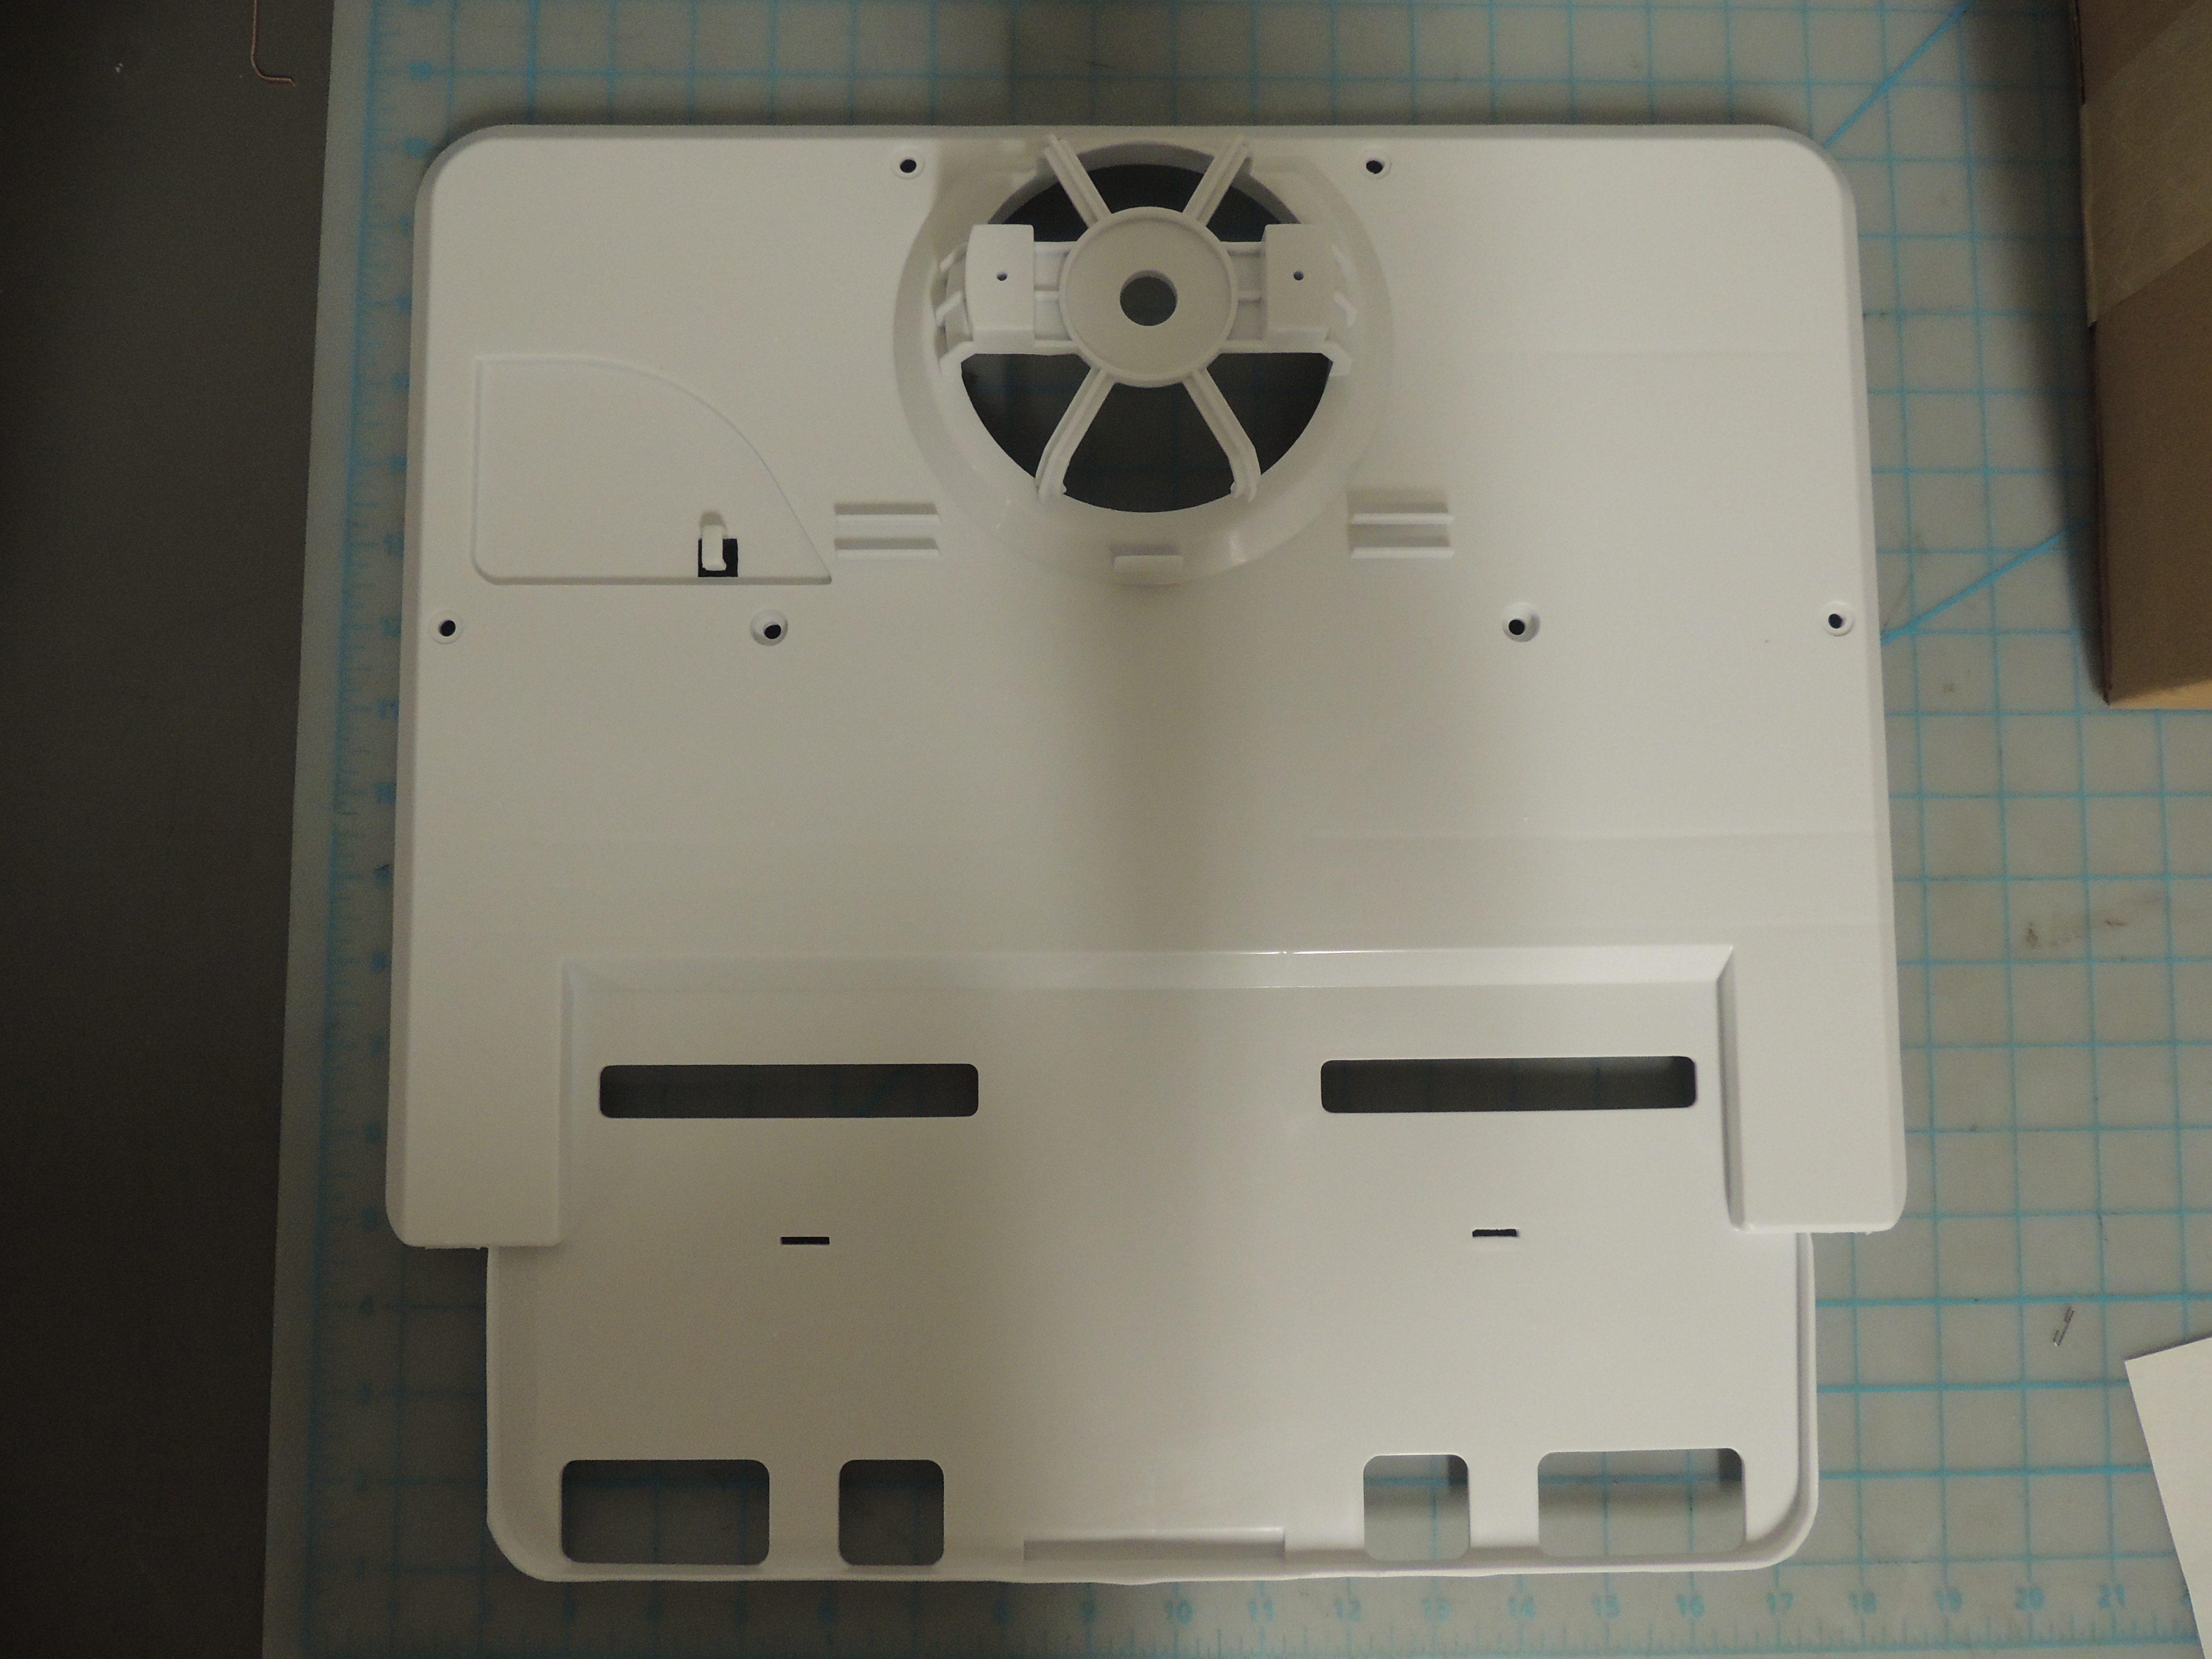 DFF9100 AIR OUTLET INSIDE PLAT